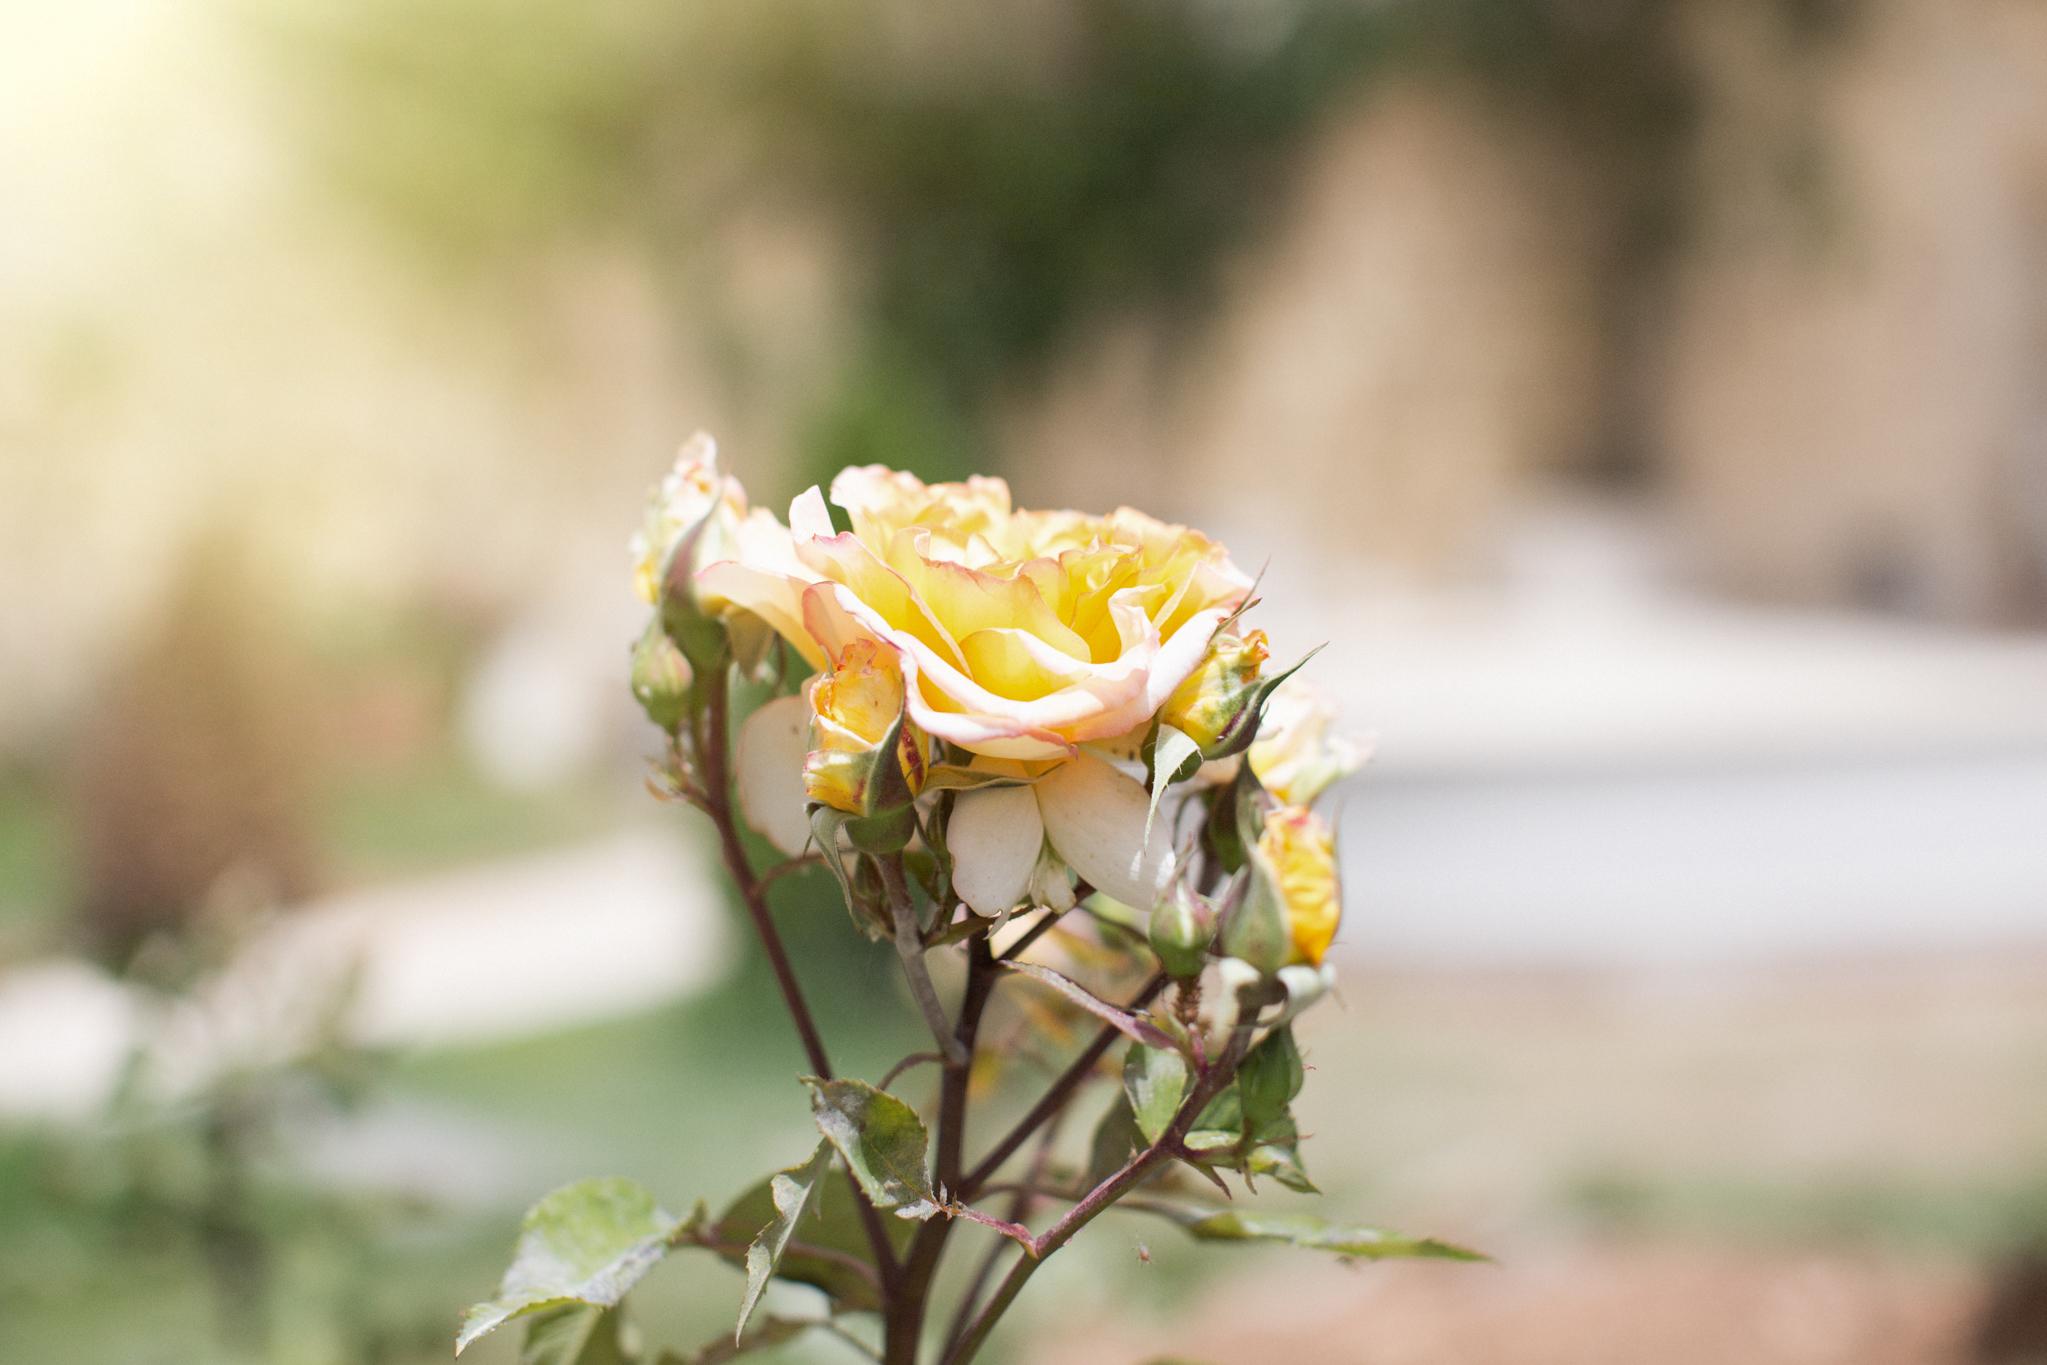 palazzio parisio, malta breakfast, best breakfast, high end, family photographer malta, svensk i malta, gardens of malta, historic architecture naxxar